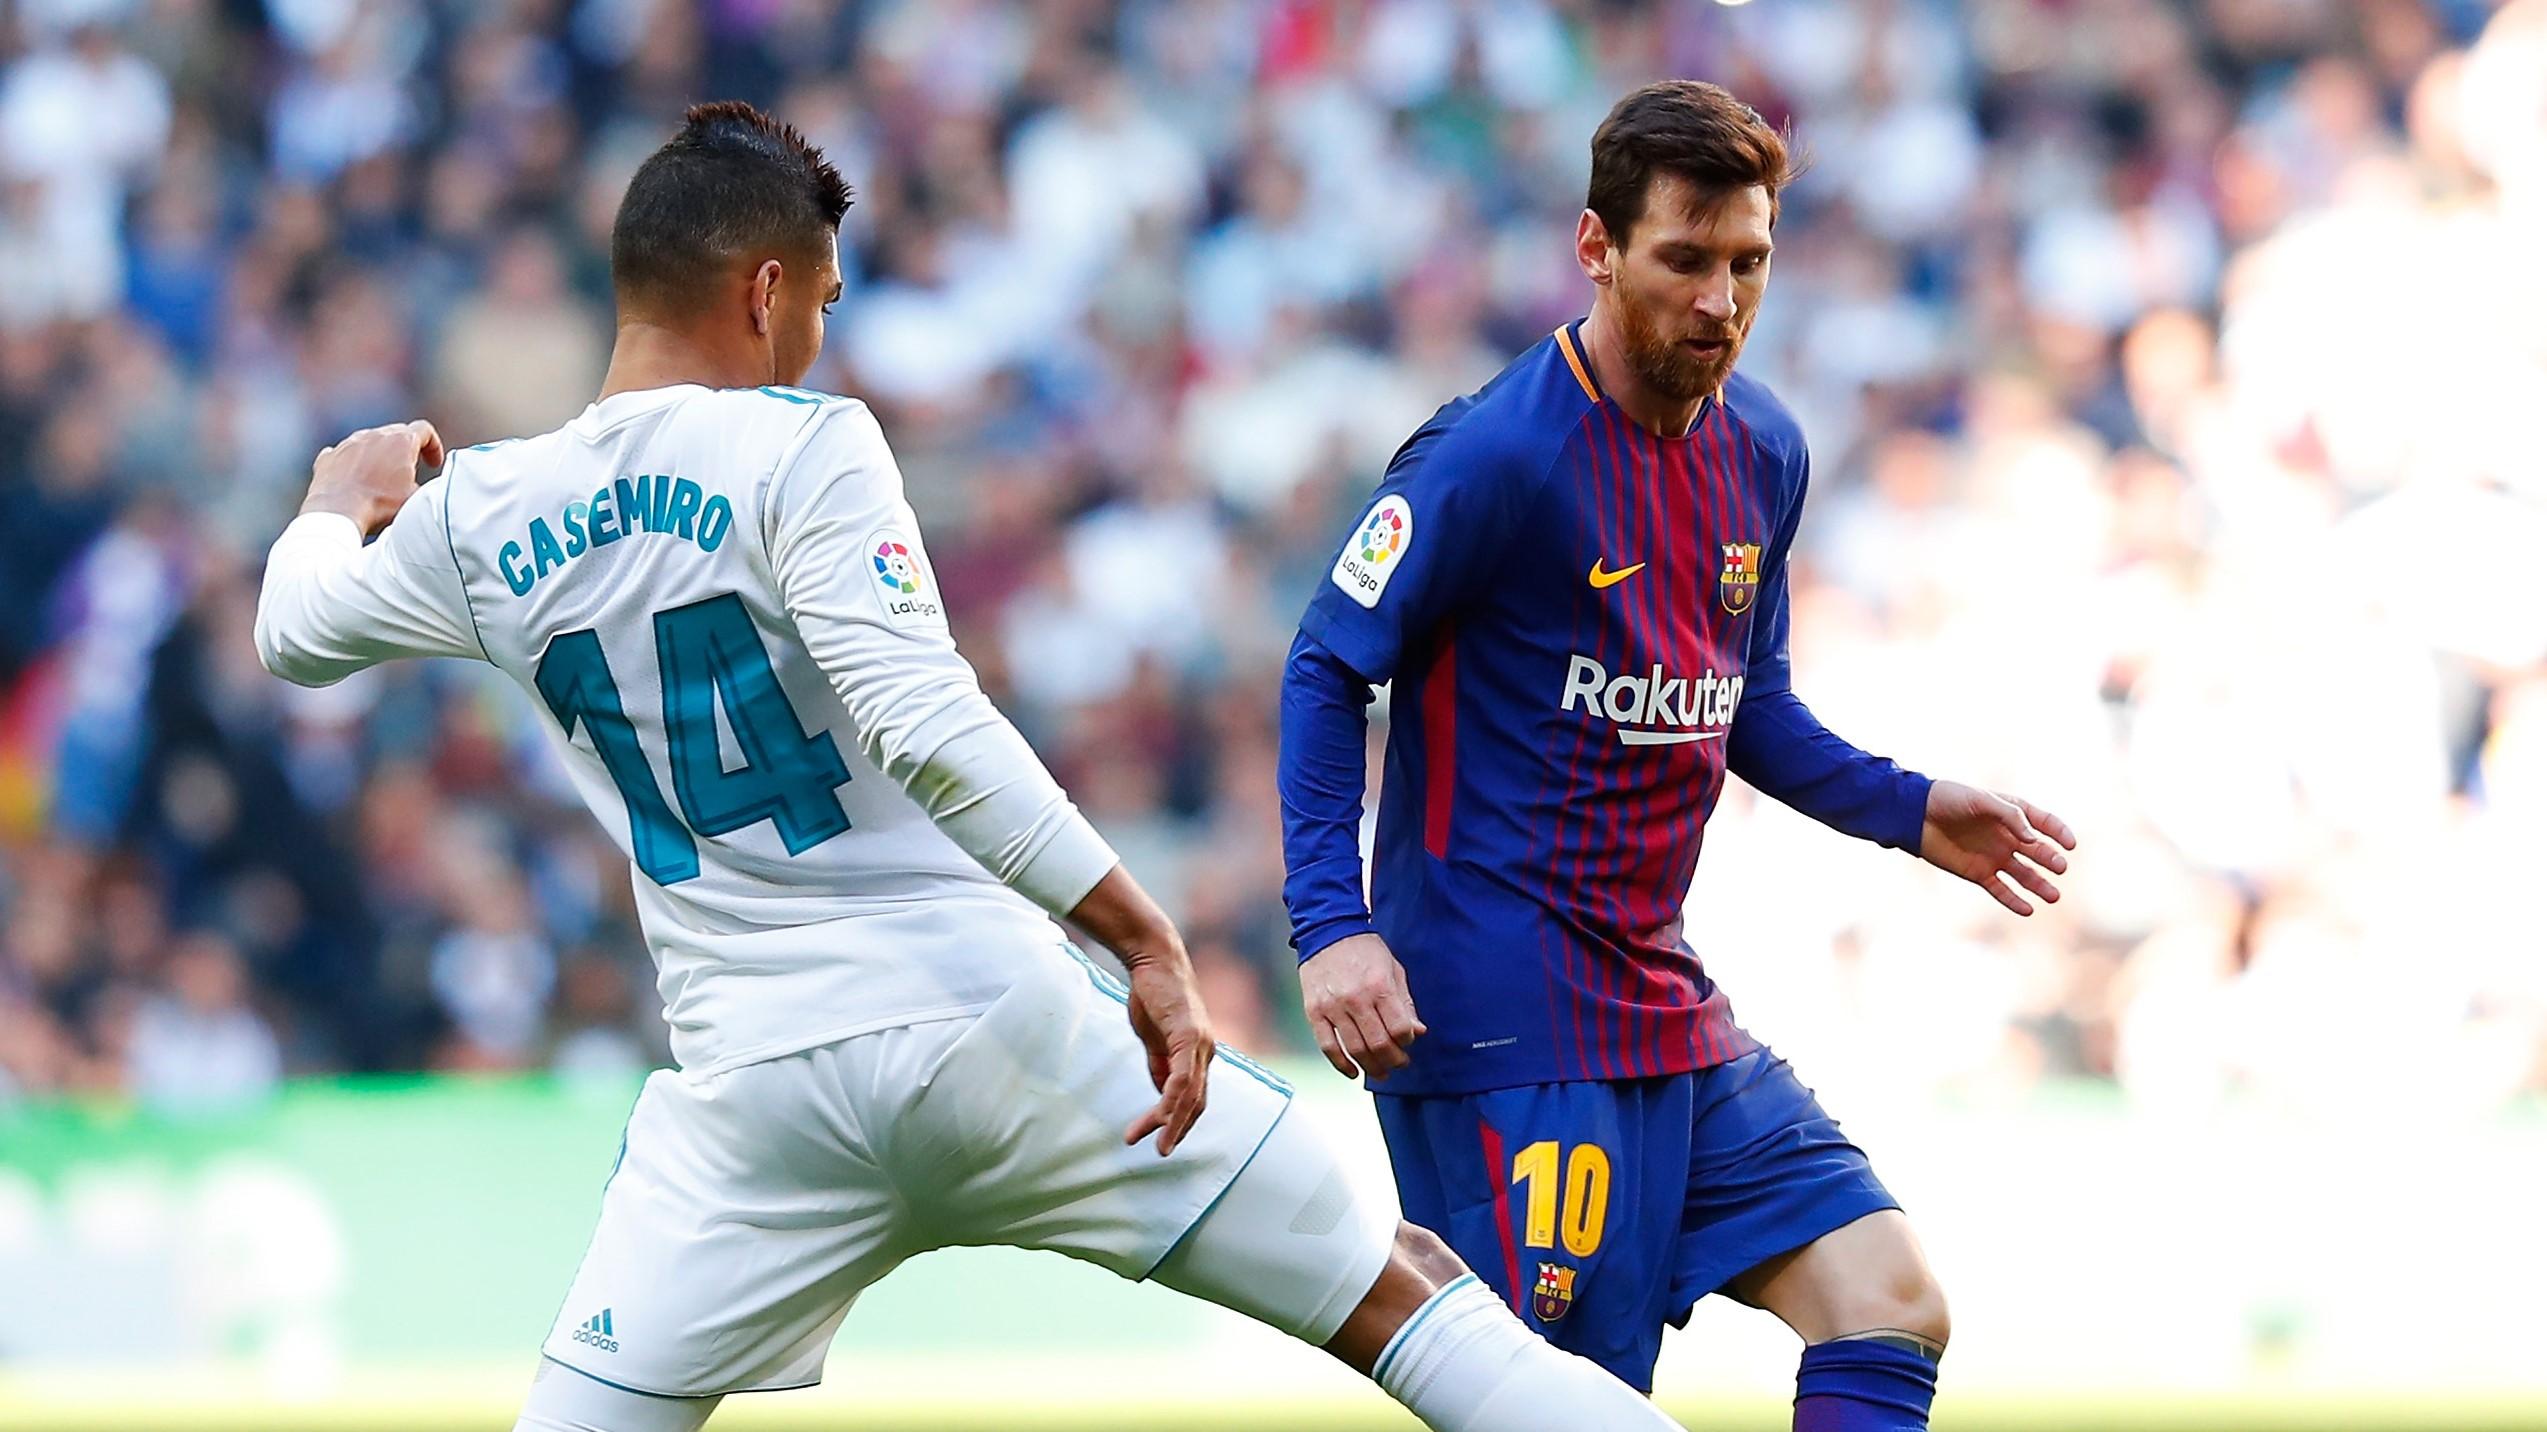 Lionel Messi Casemiro Real Madrid Barcelona El Clásico LaLiga 23122017 b54484af50359